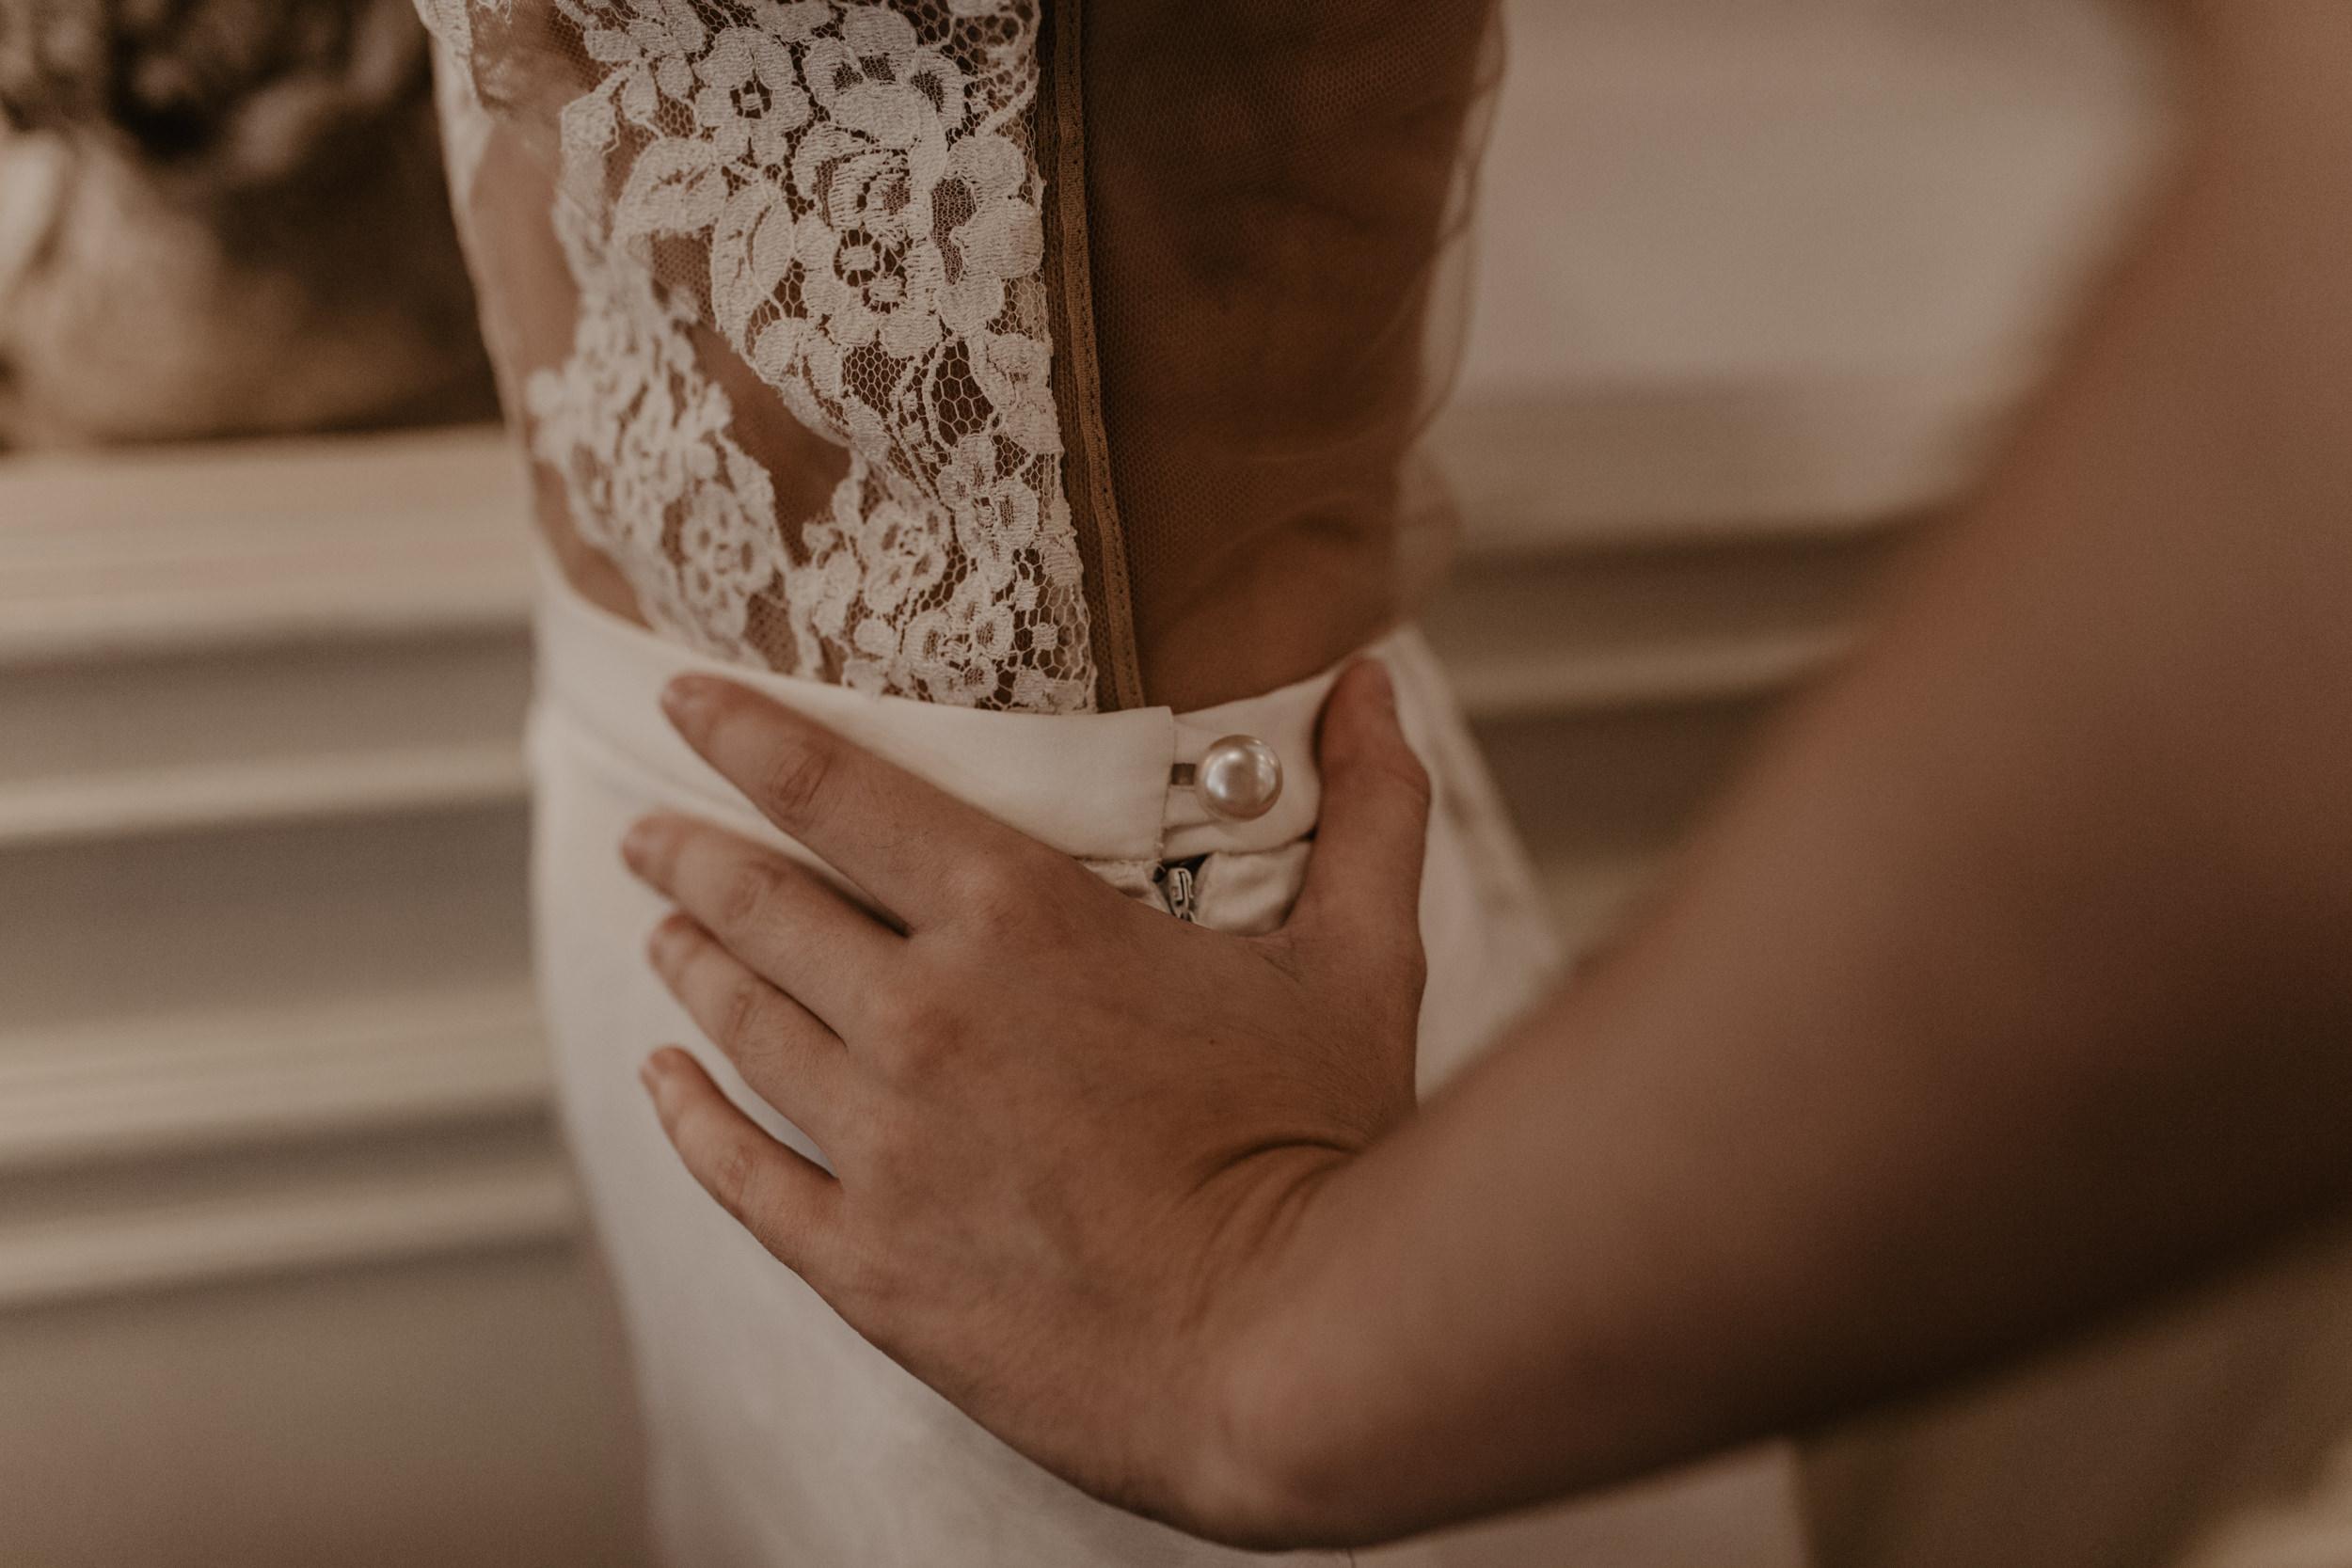 thenortherngirlphotography_photography_thenortherngirl_rebeccascabros_wedding_weddingphotography_weddingphotographer_barcelona_fashionbarcelona_unconventionalwedding_lacasademuñecas-49.jpg